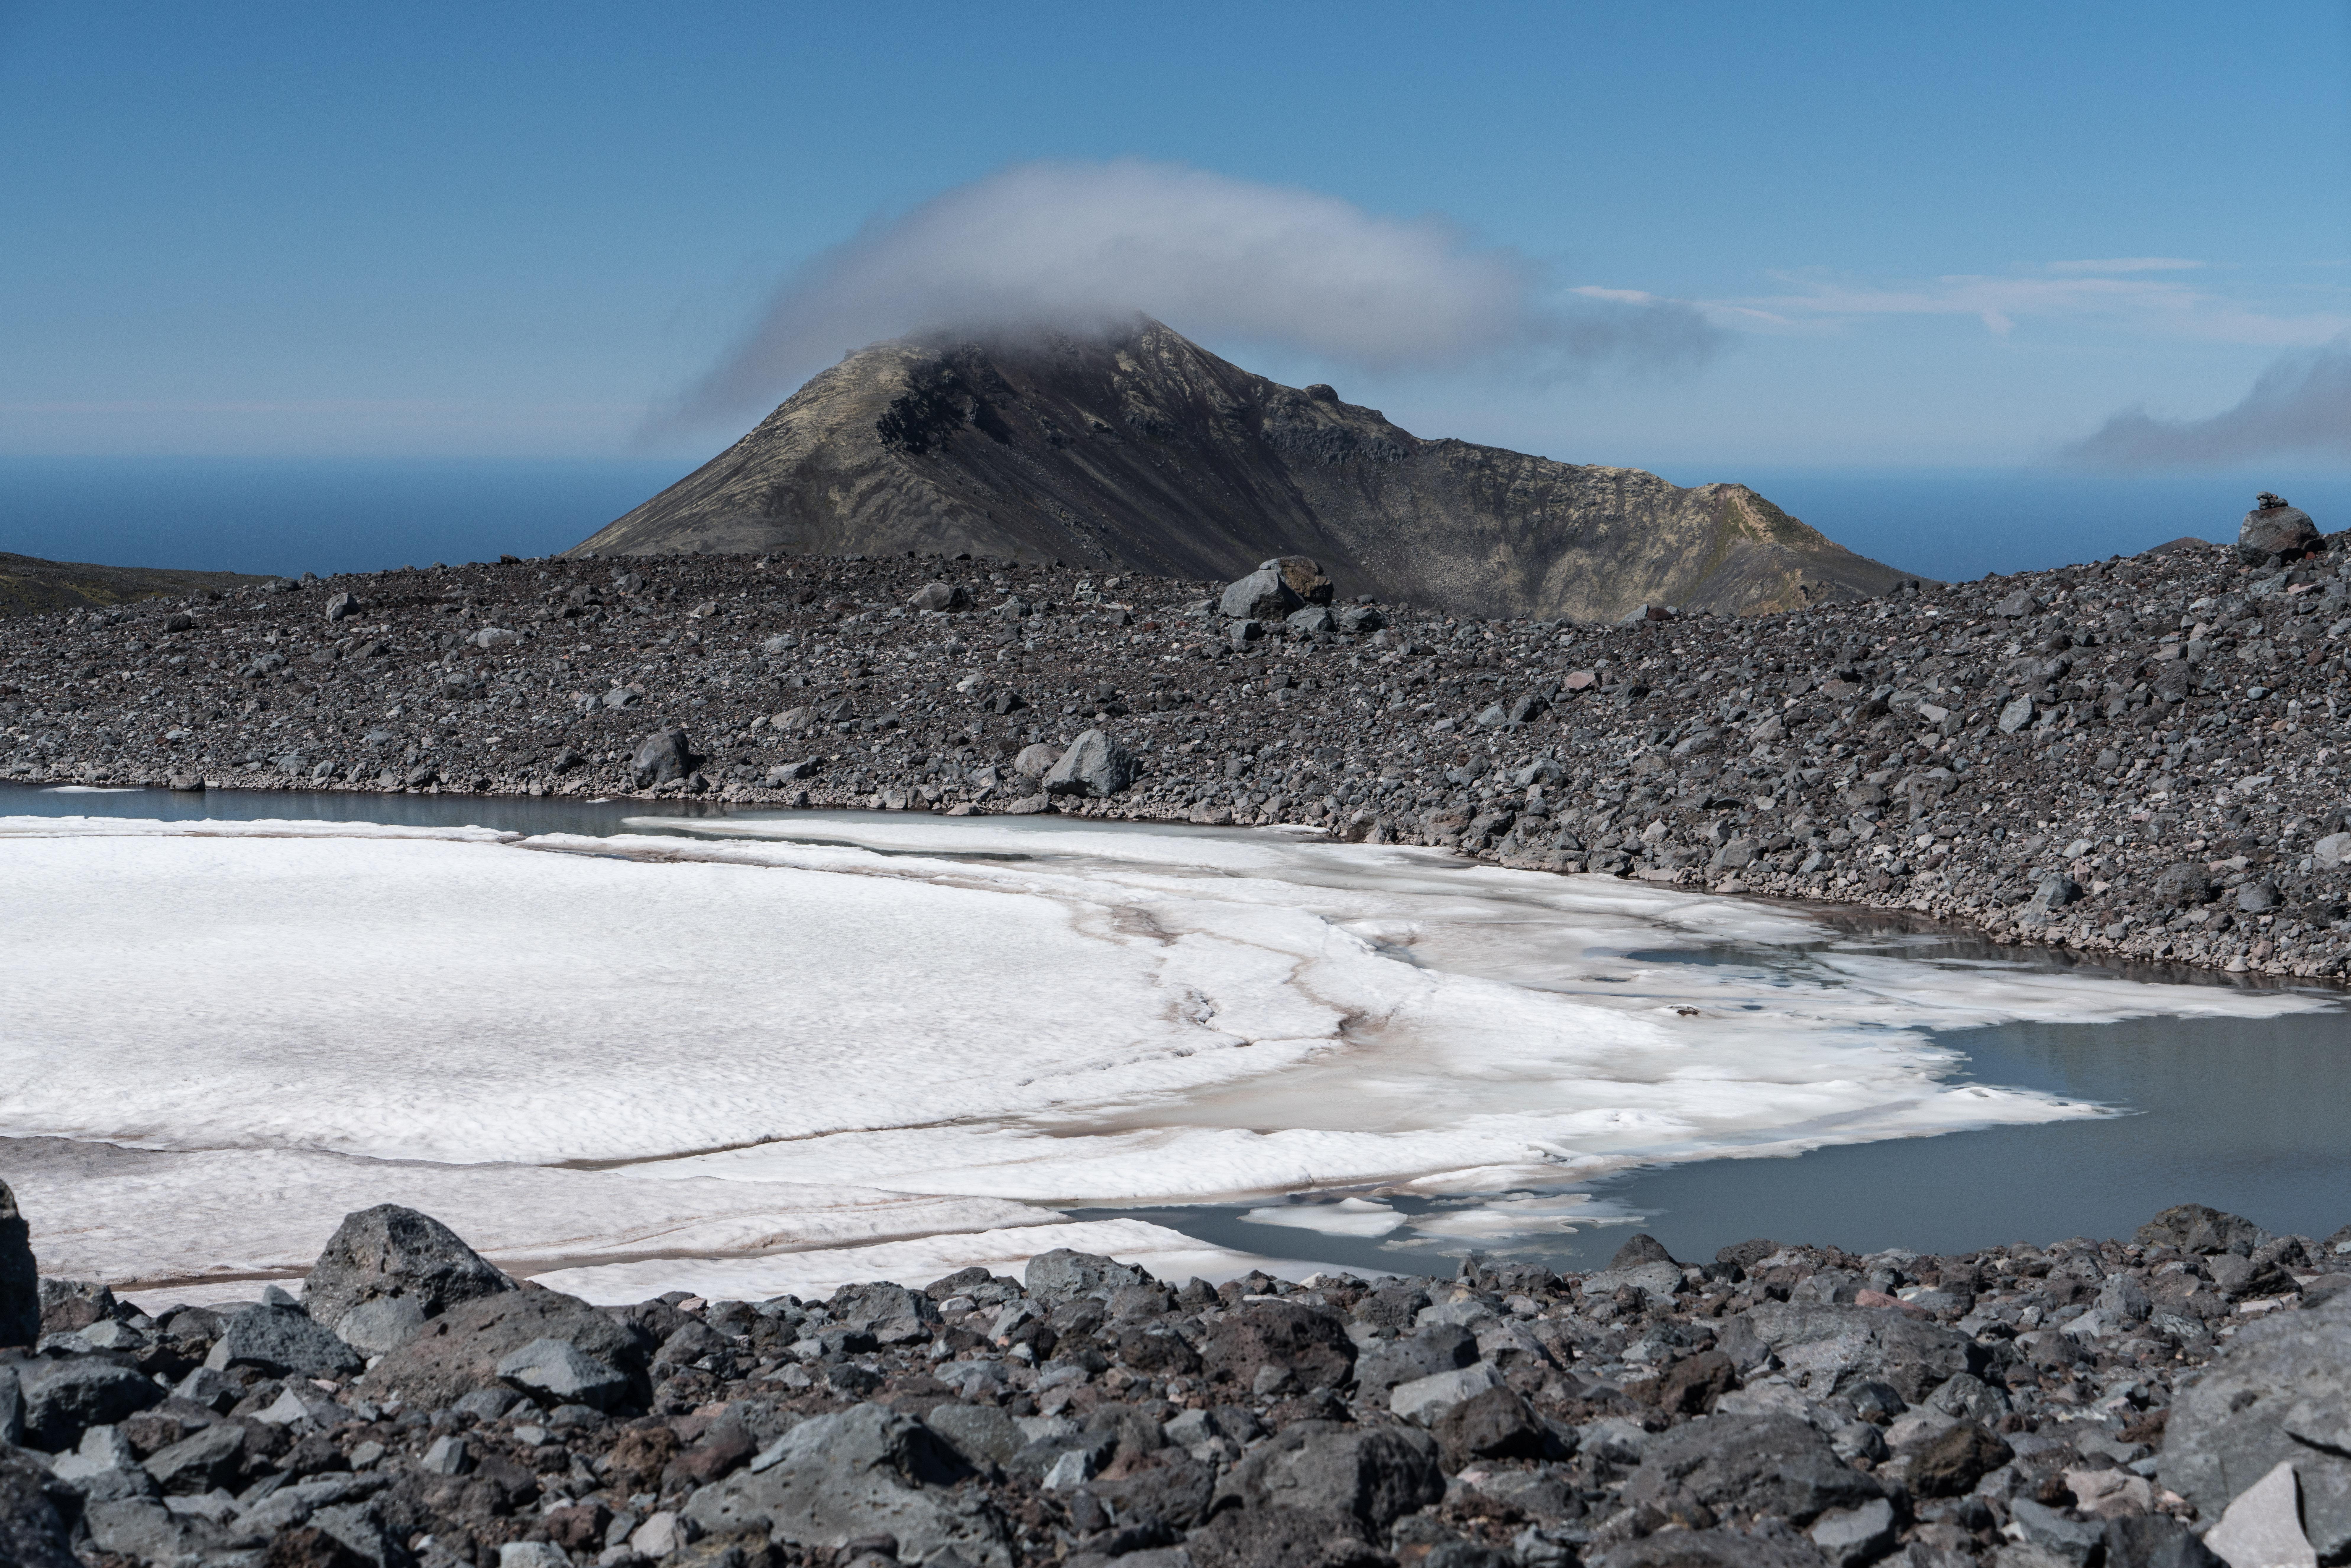 #glacier, #lake, #snaefellsjokull, #iceland, #hike, #lava, #snow, #globalwarming, #nature,